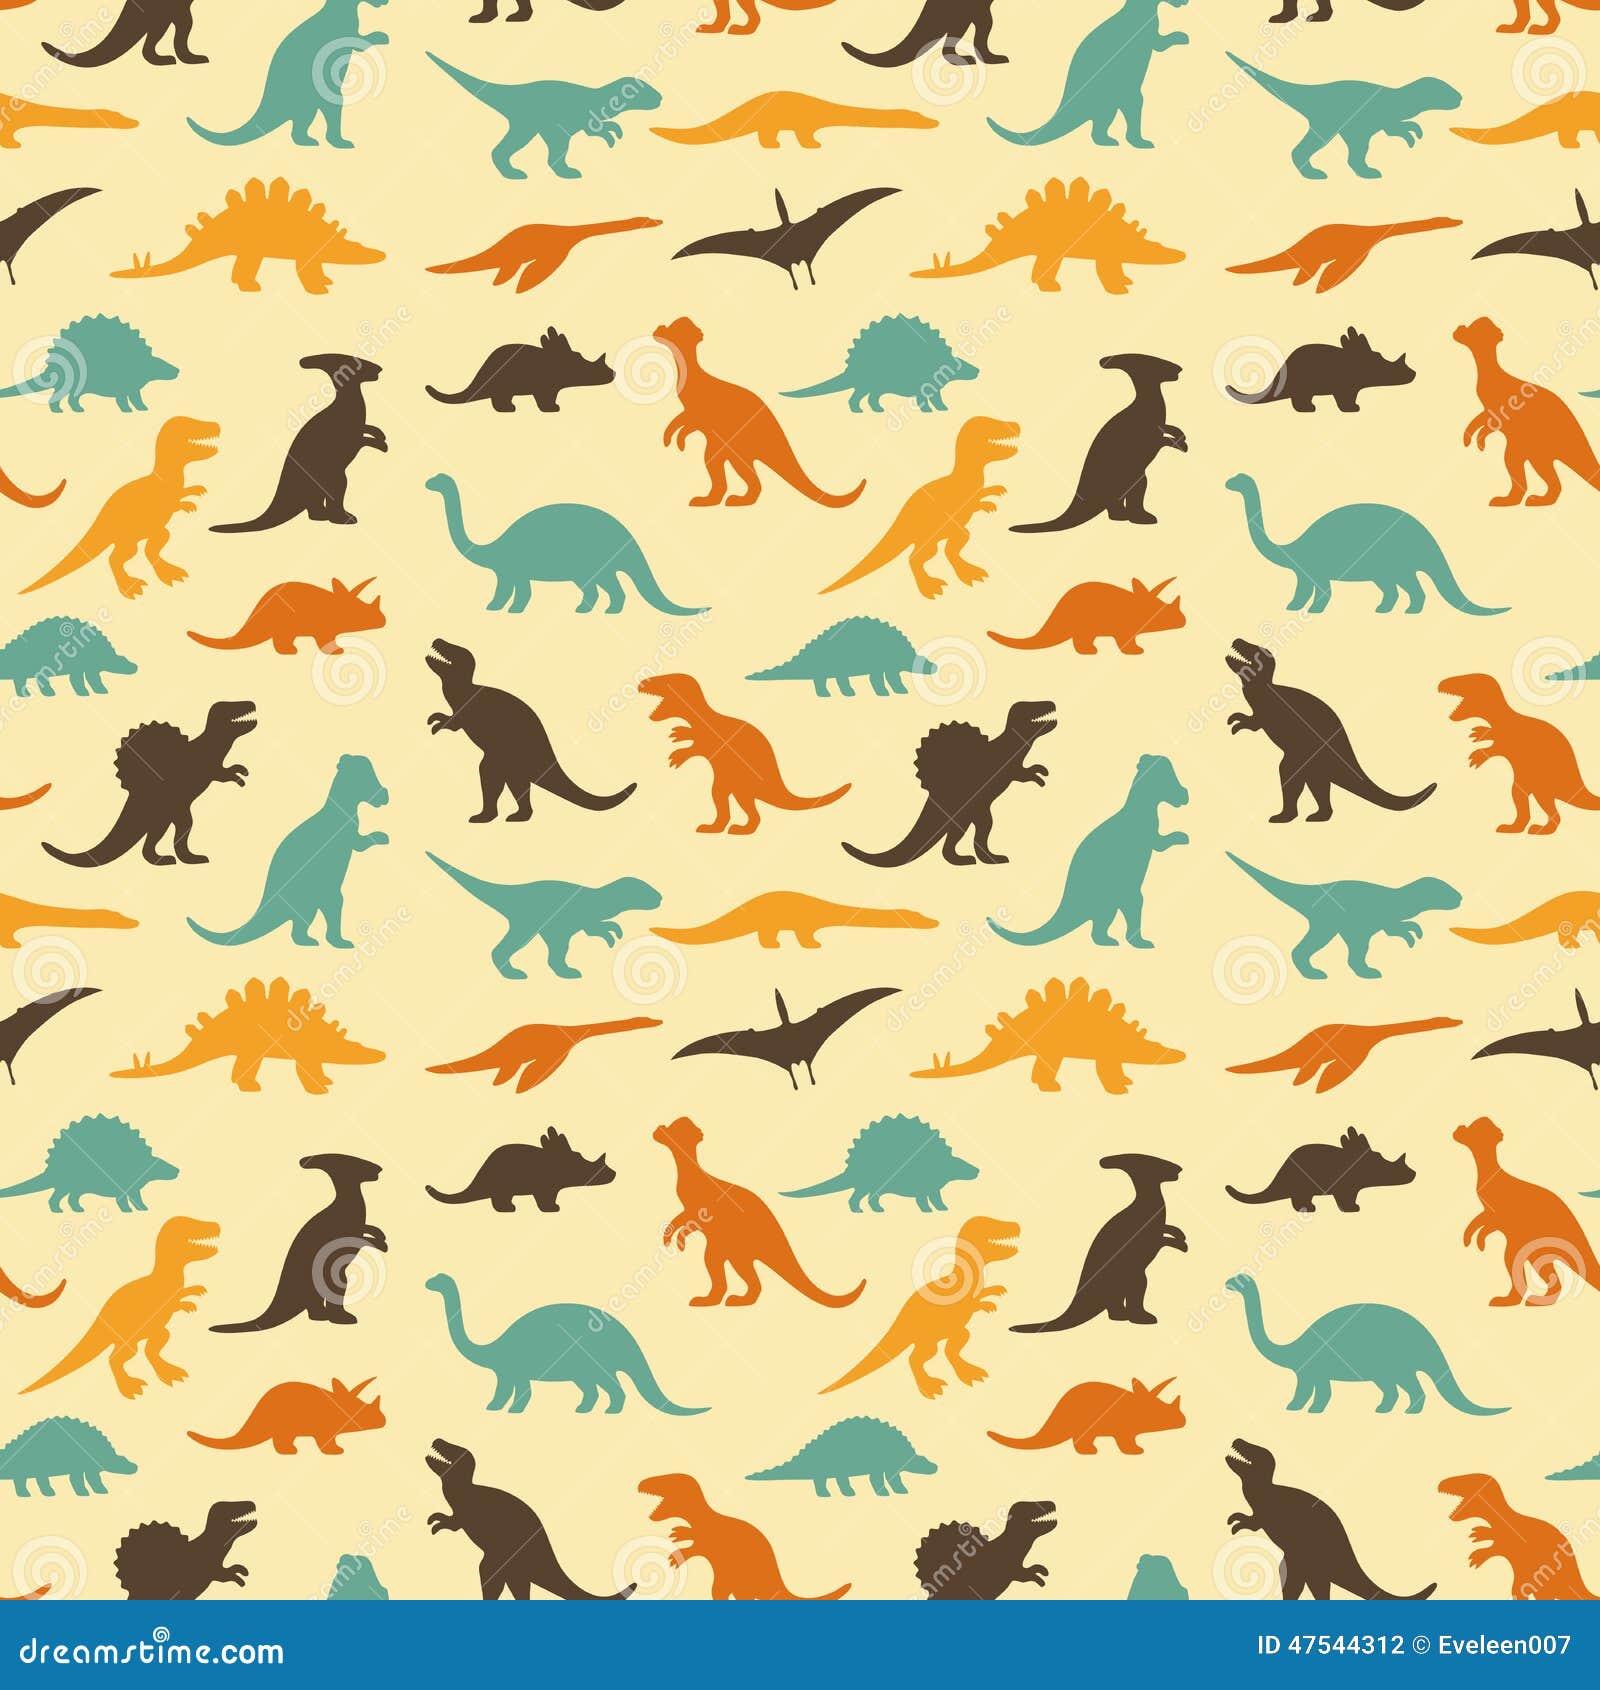 Dinosaur retro pattern